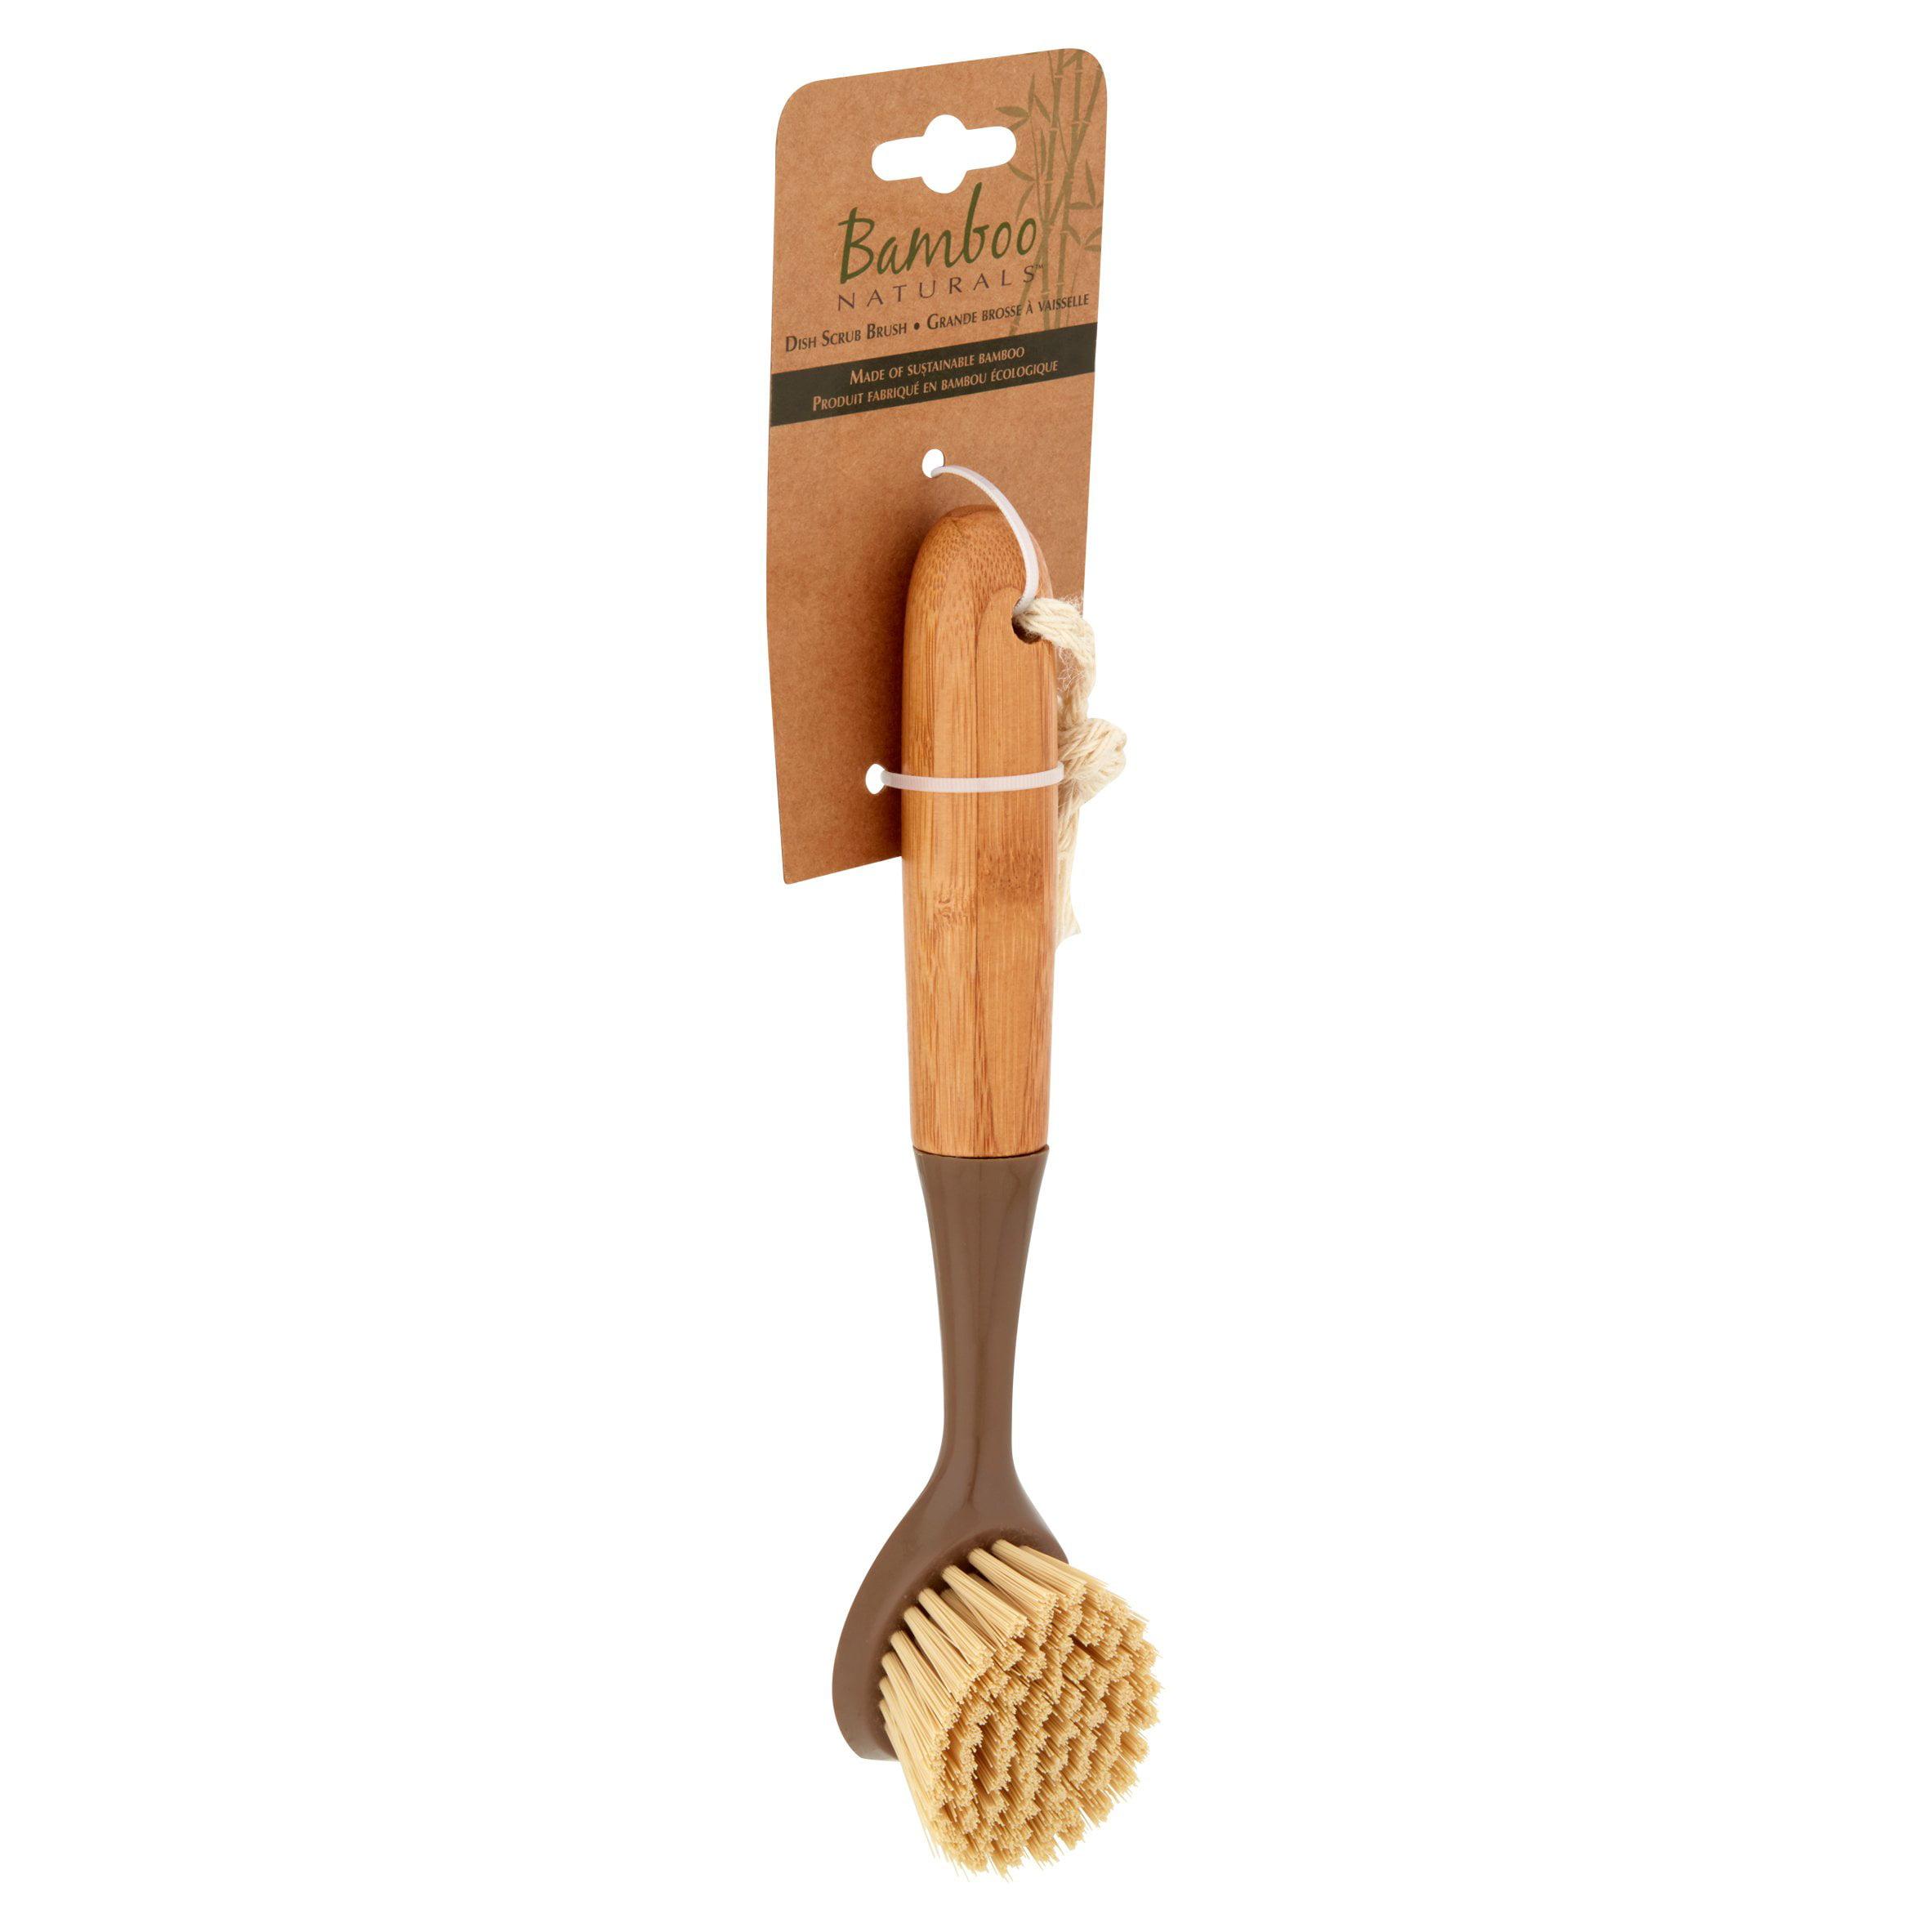 Evri Bamboo Dish Scrub Brush - Walmart.com